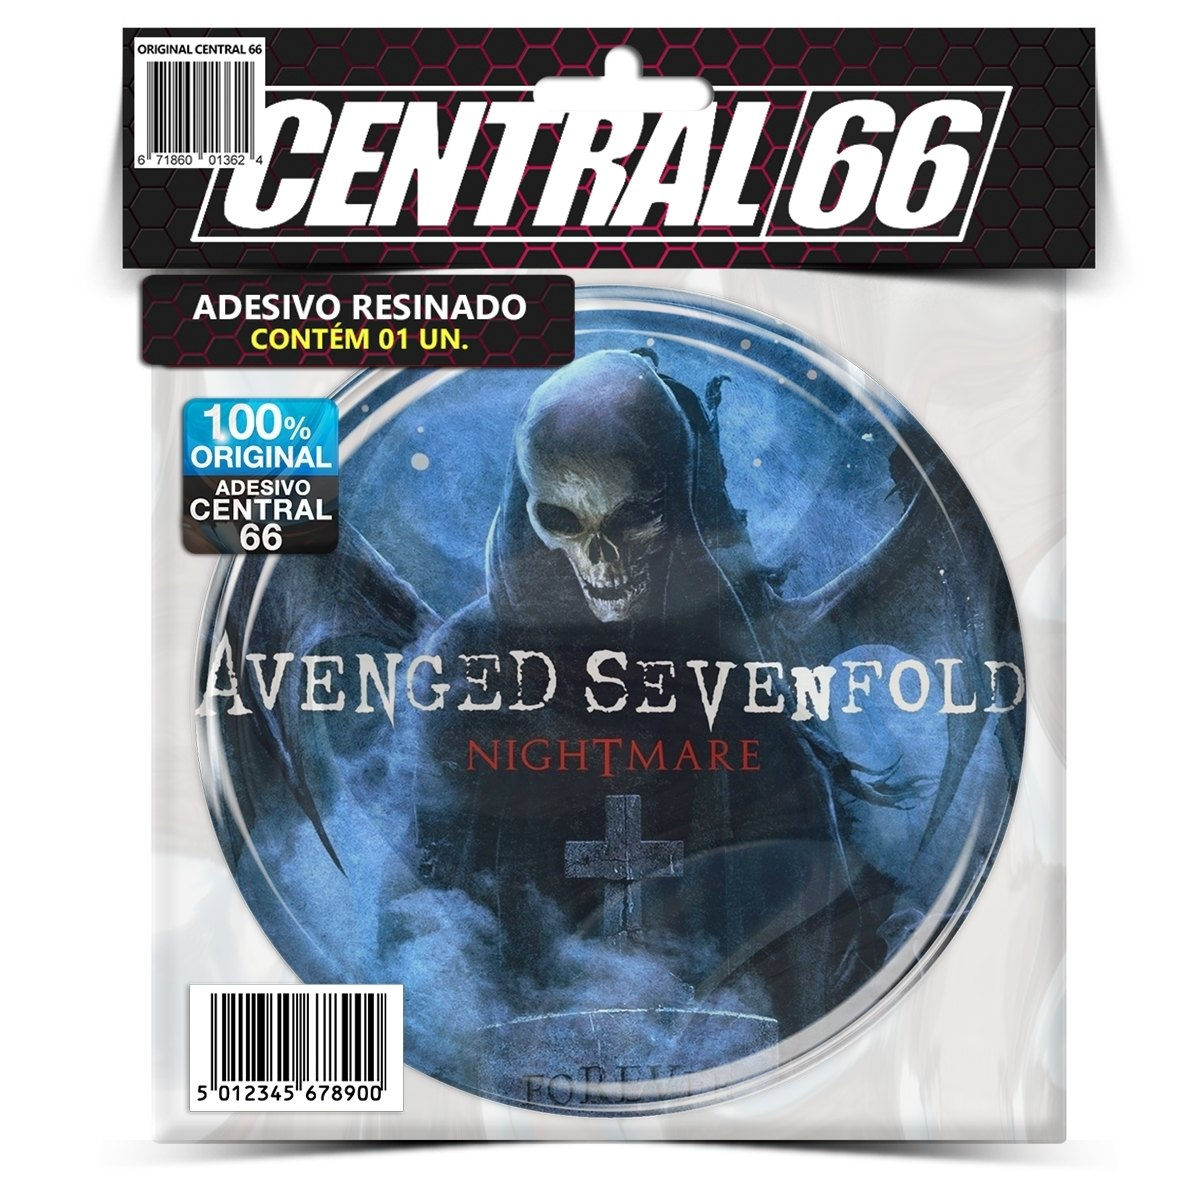 Adesivo Redondo Avenged Sevenfold Nightmare – Central 66